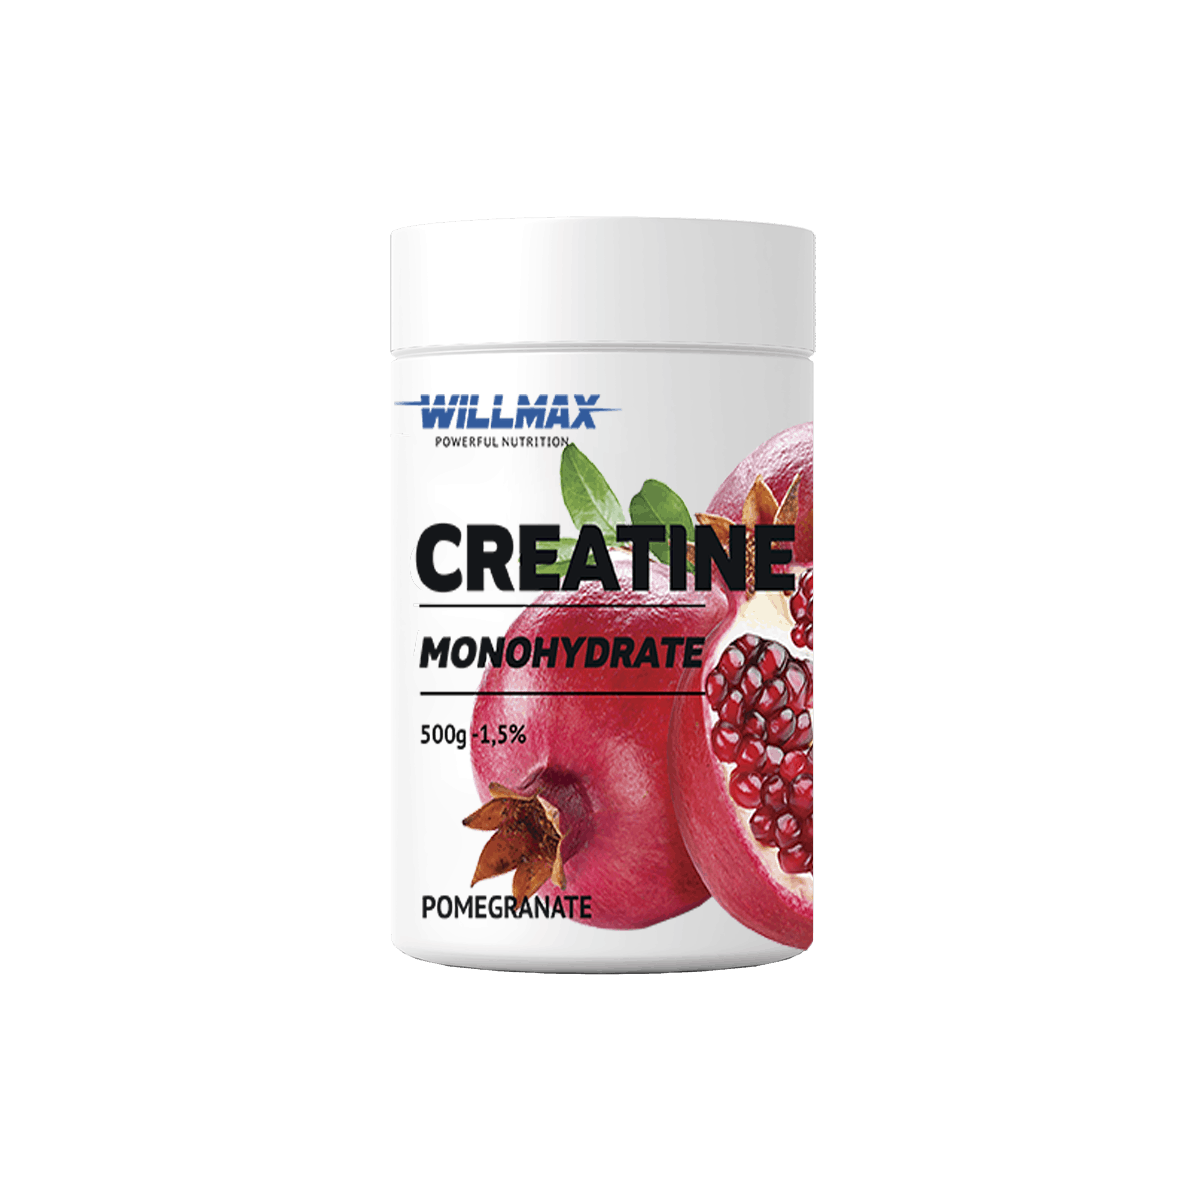 Креатин Willmax Creatine Monohydrate 500g ГРАНАТ